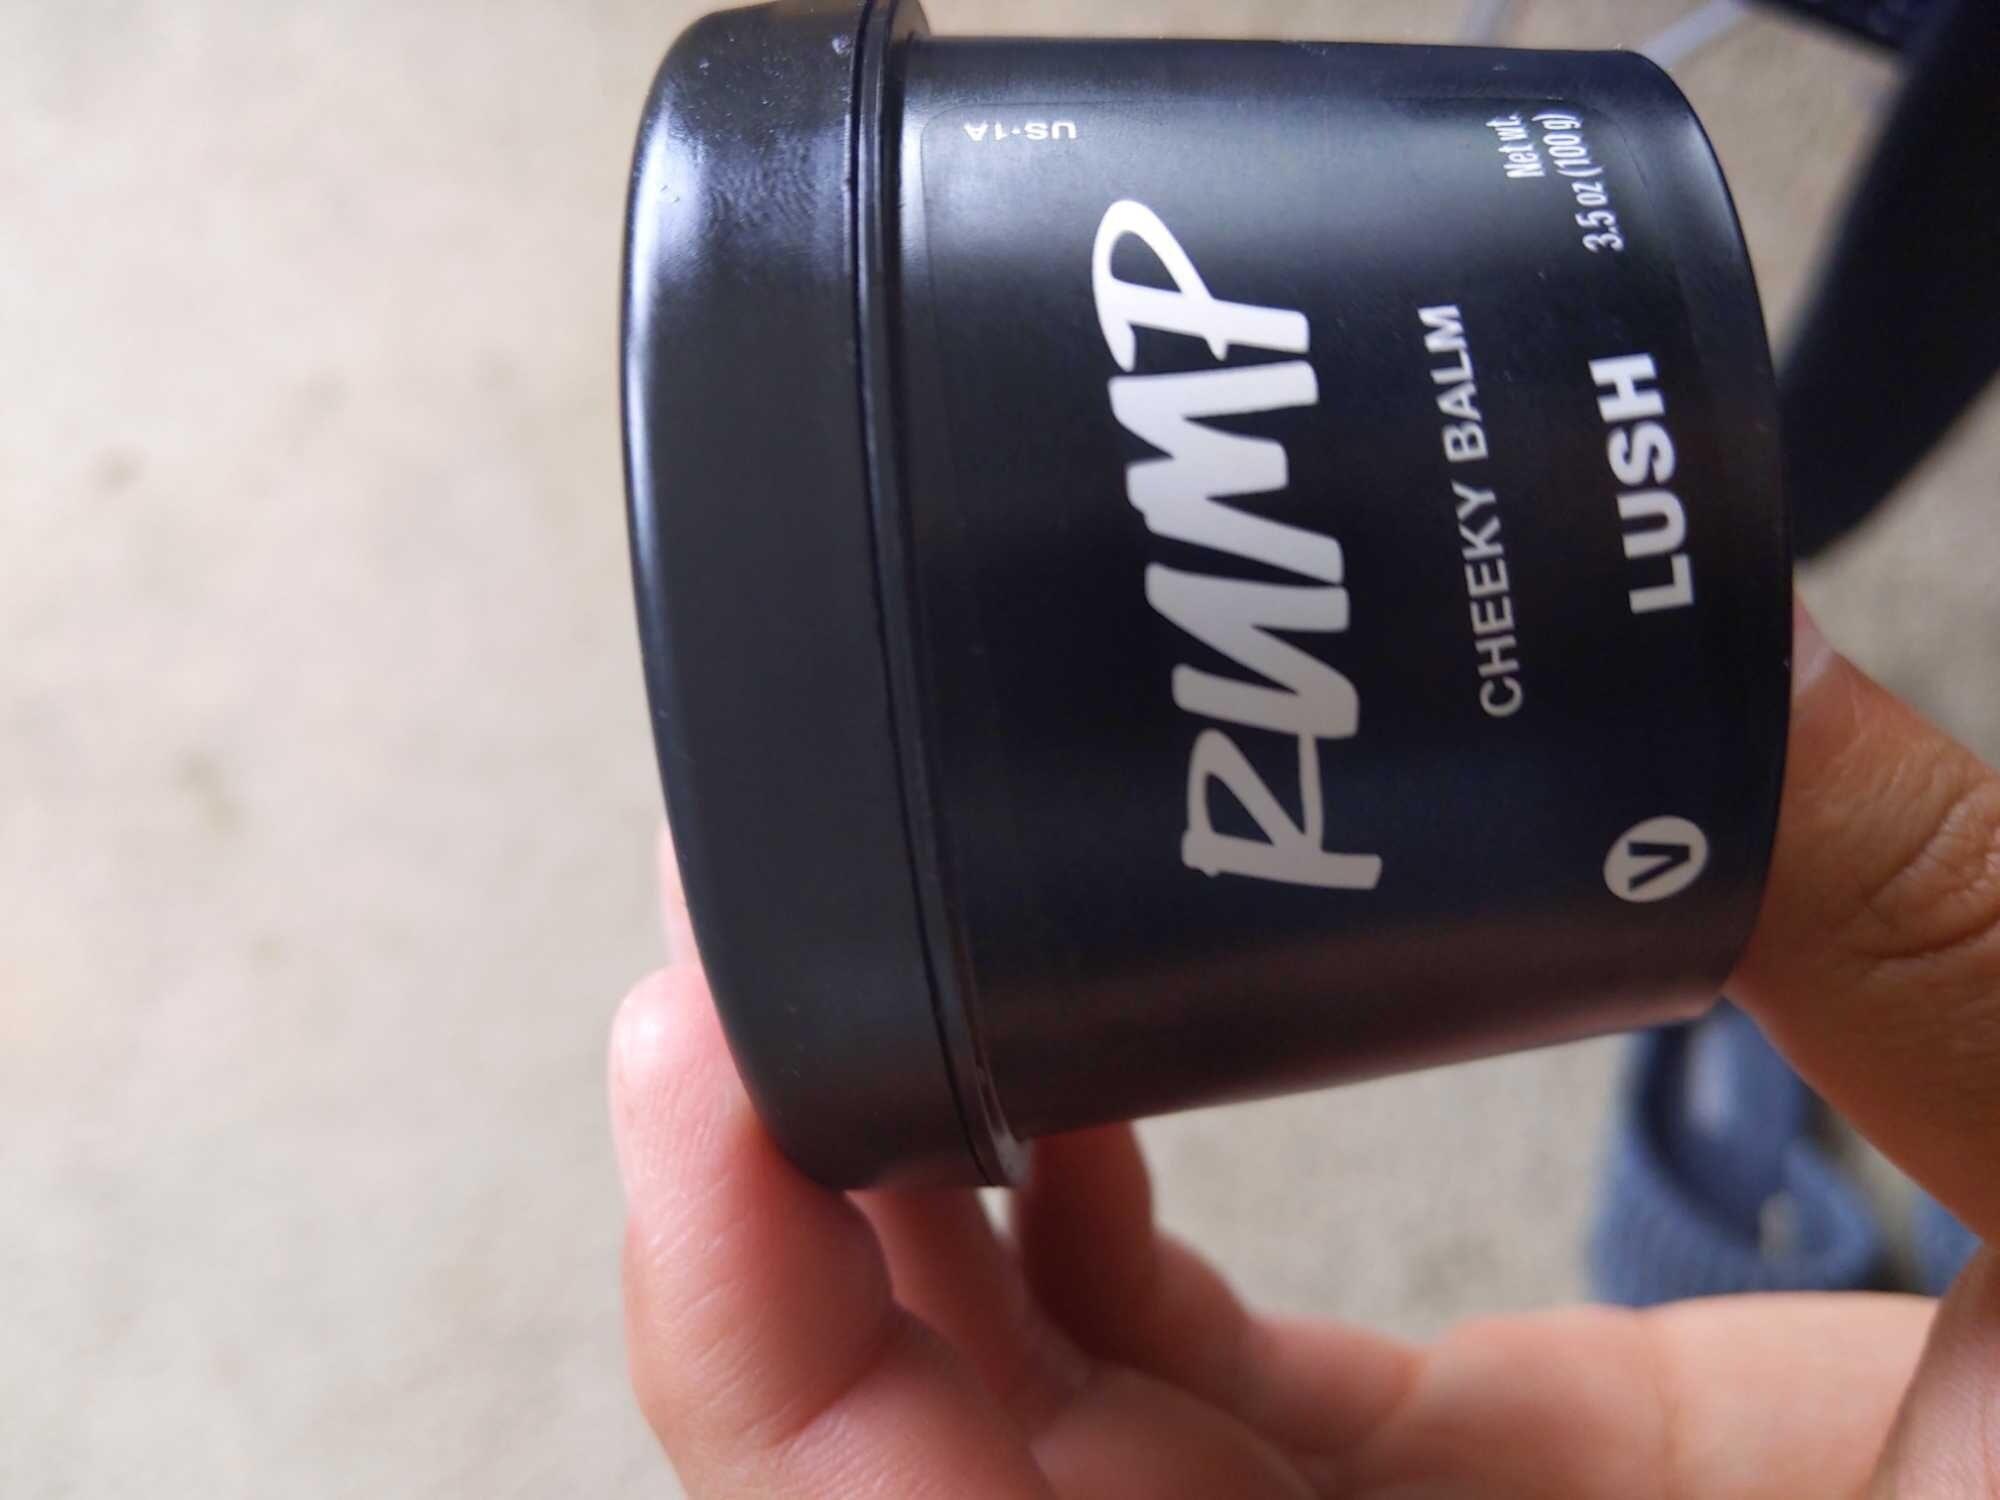 Rump, Cheeky Balm - Product